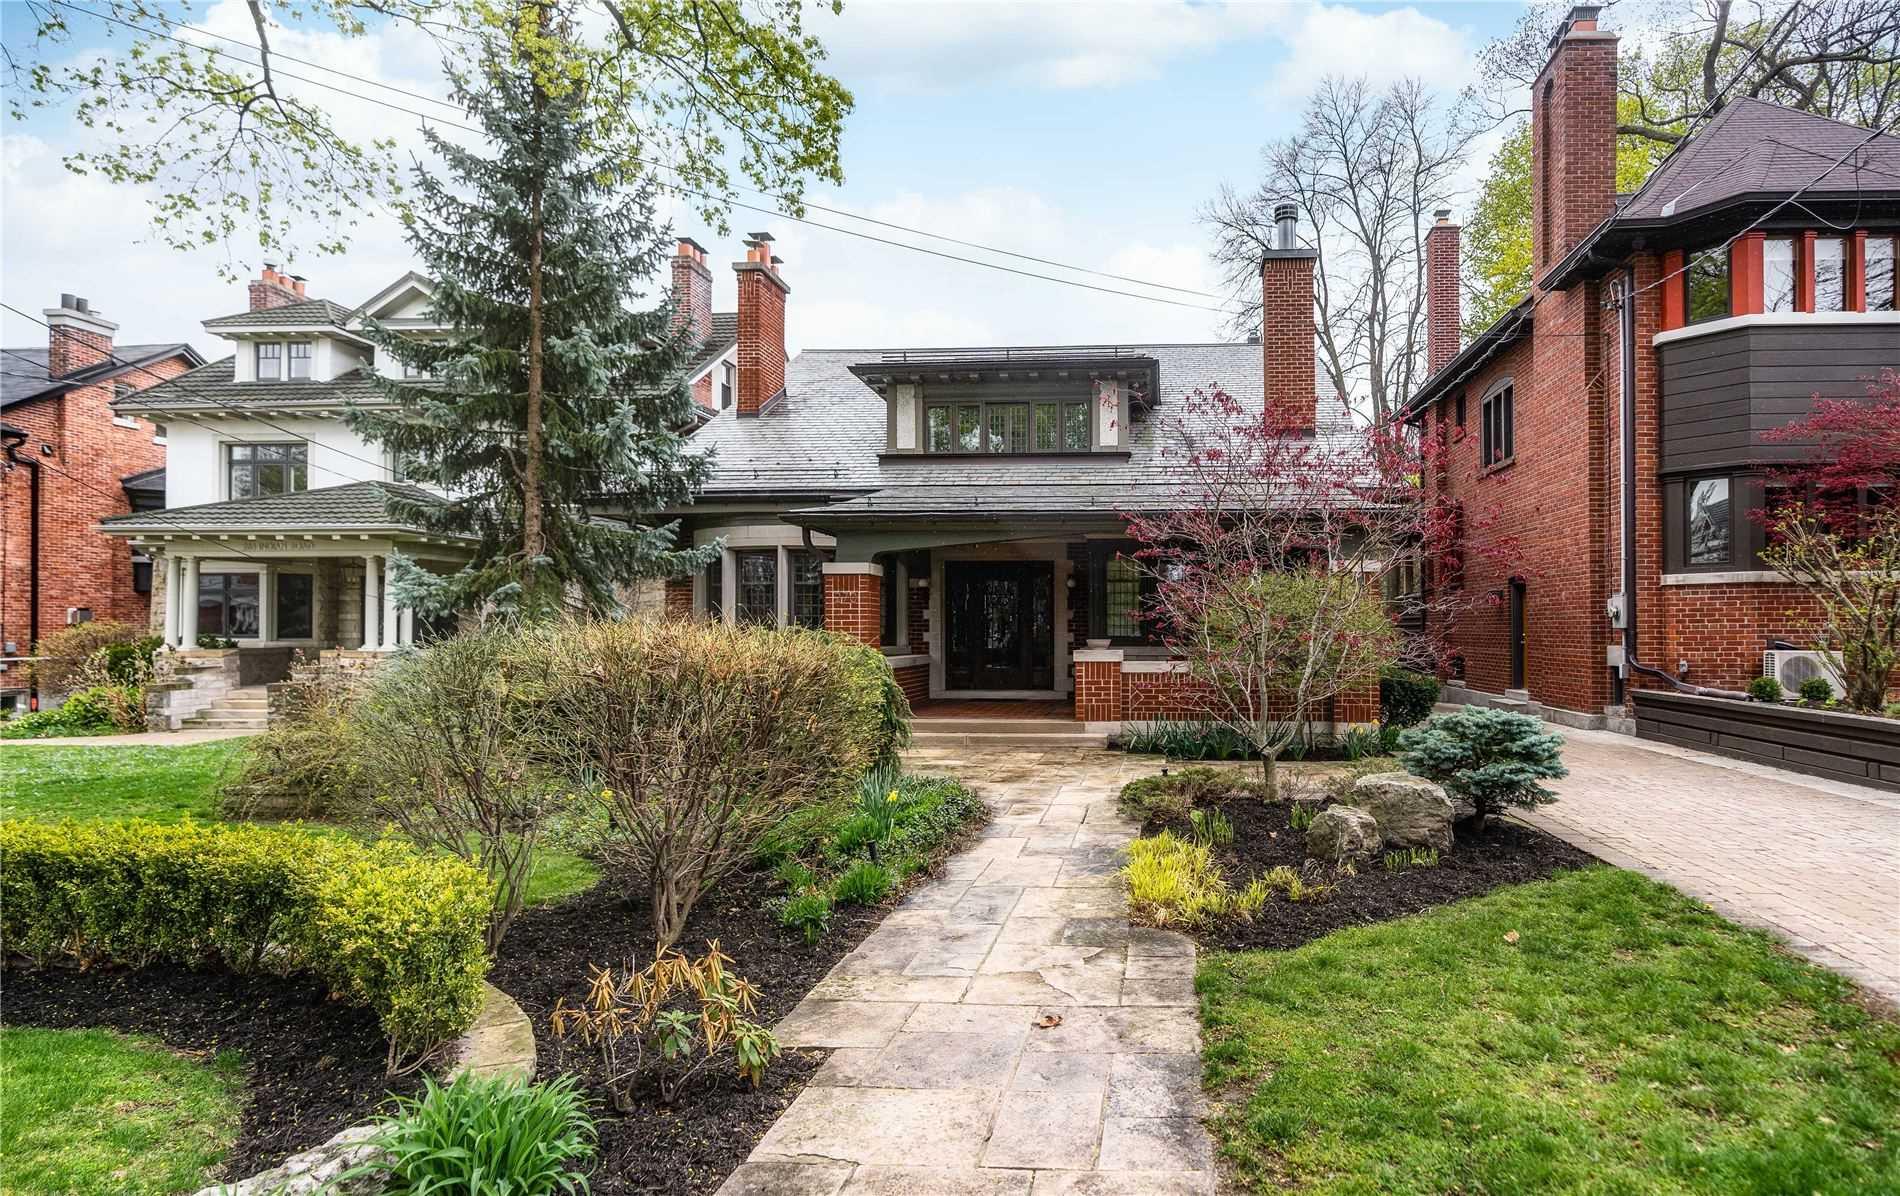 270 Indian Rd, Toronto, Ontario M6R2X2, 4 Bedrooms Bedrooms, 10 Rooms Rooms,7 BathroomsBathrooms,Detached,For Sale,Indian,W5234630